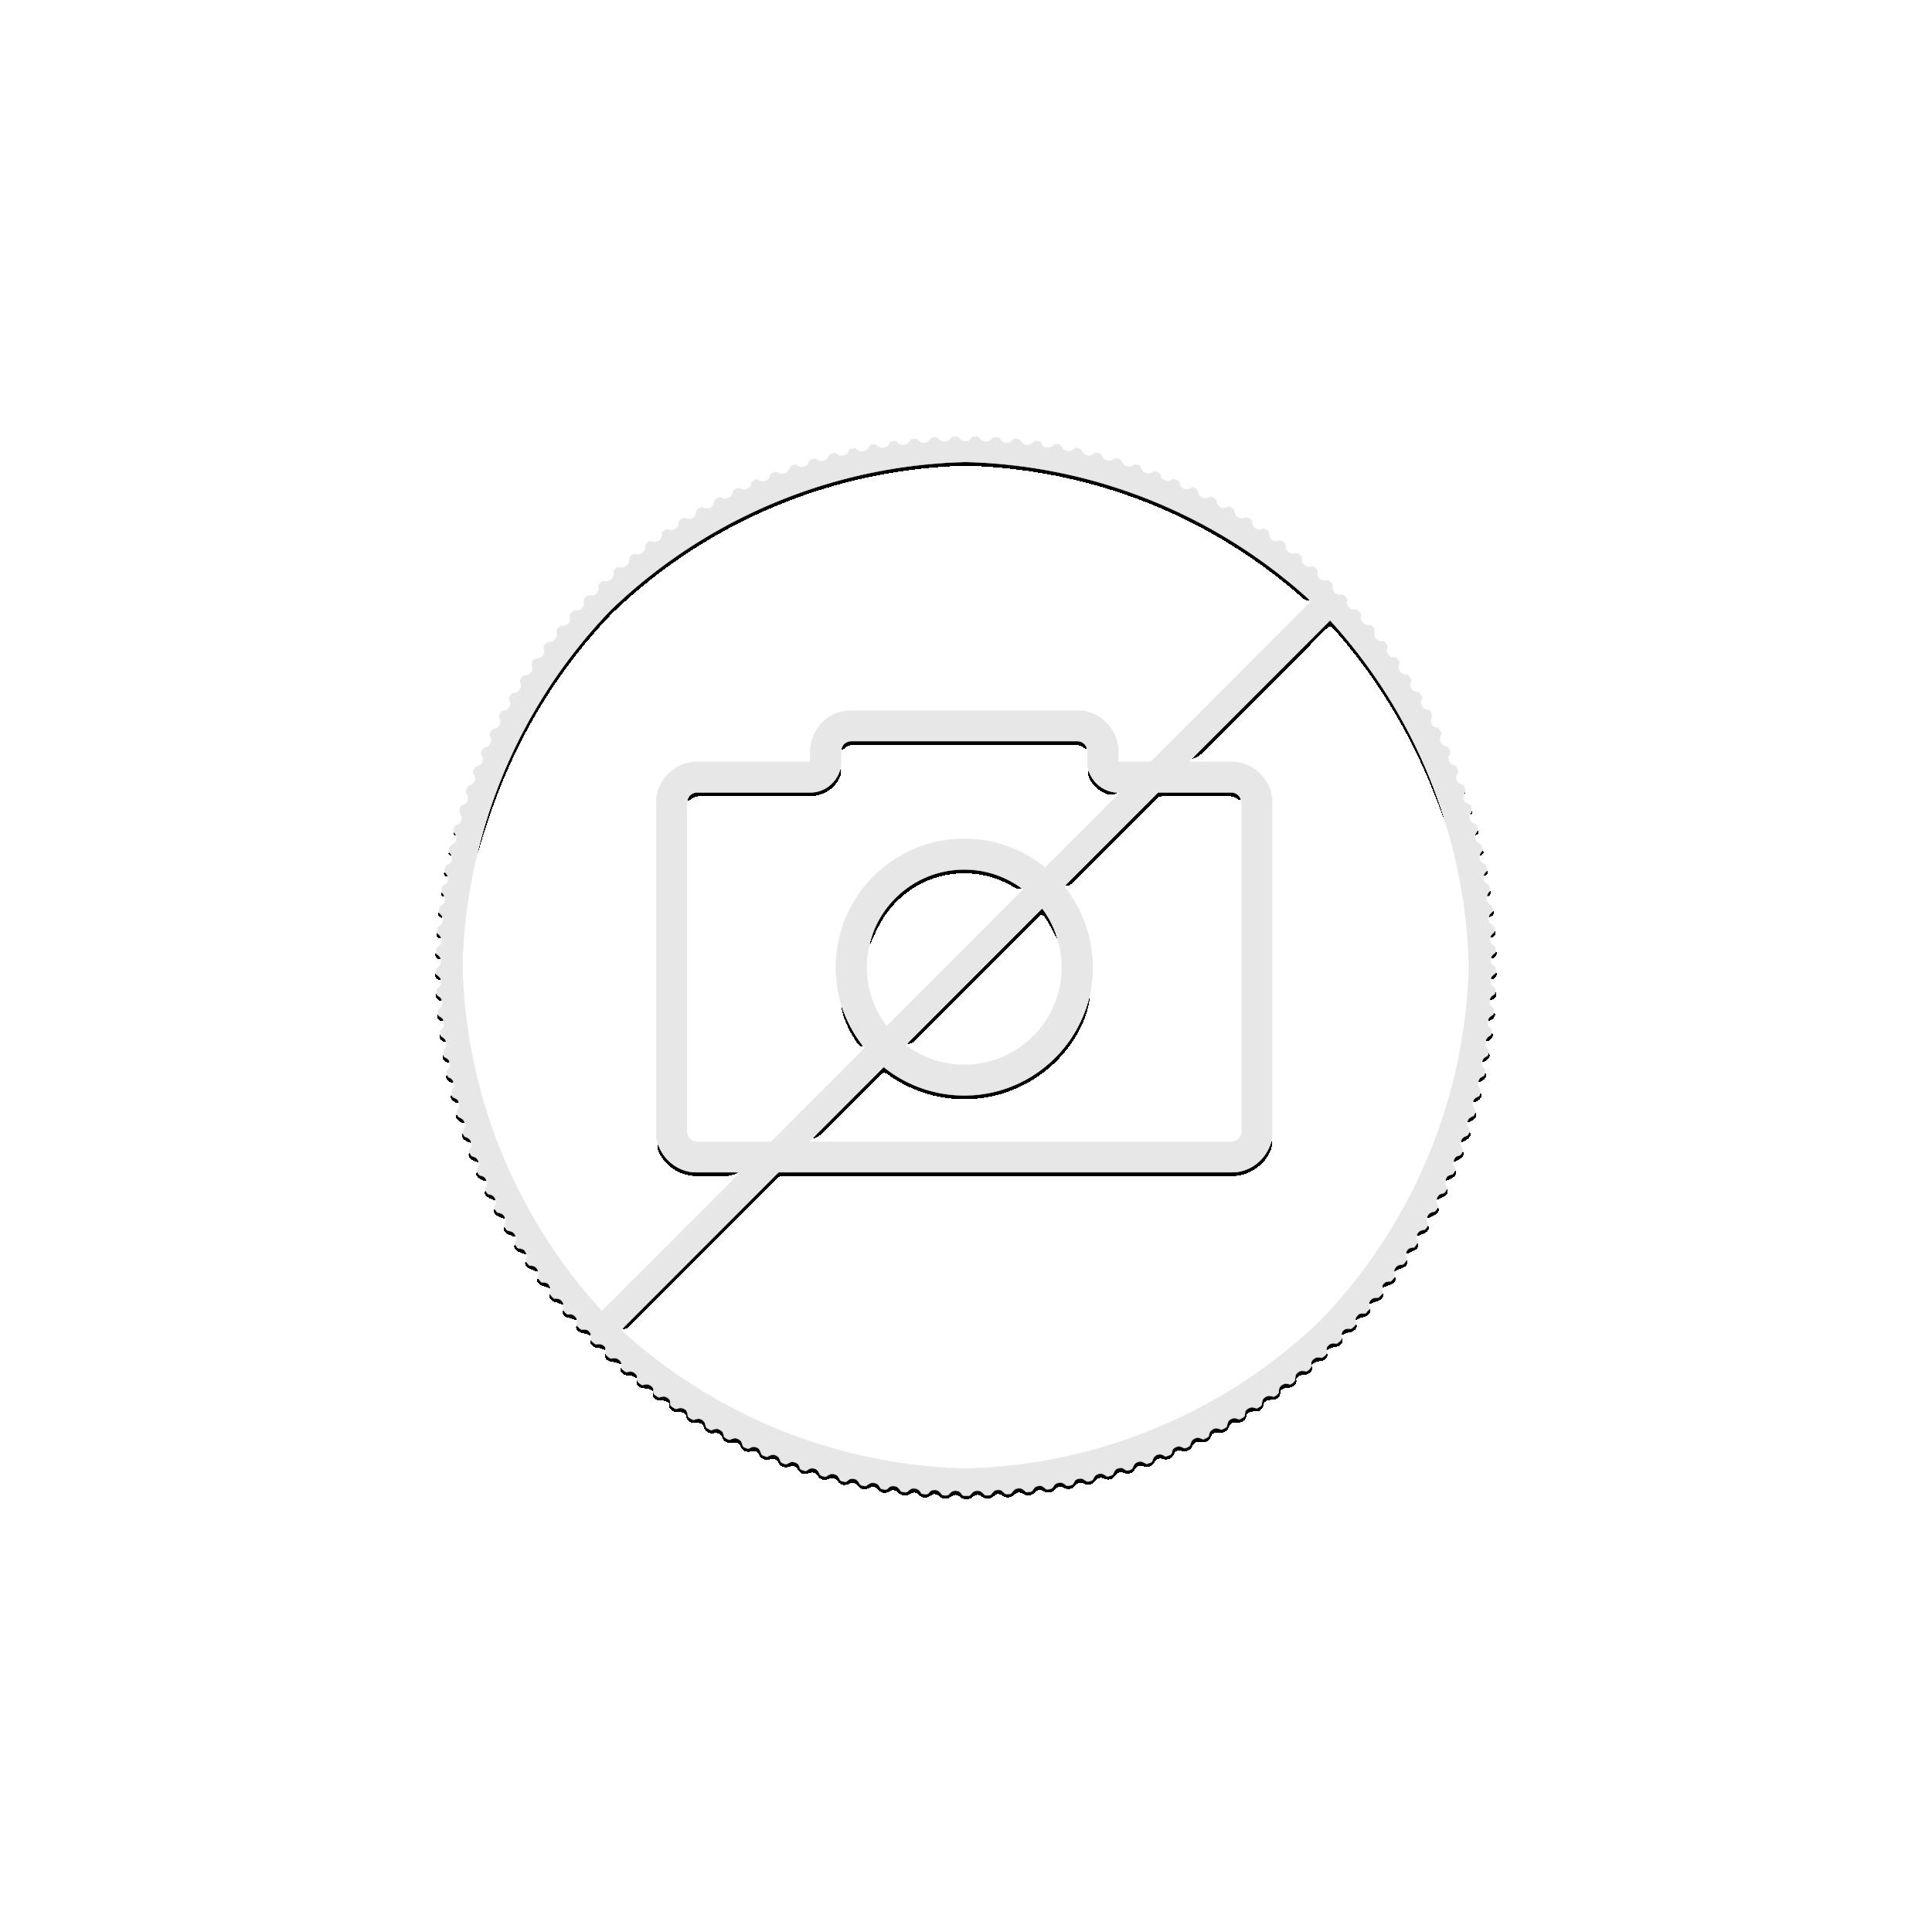 10 Troy ounce silver coin Maple Leaf 2017